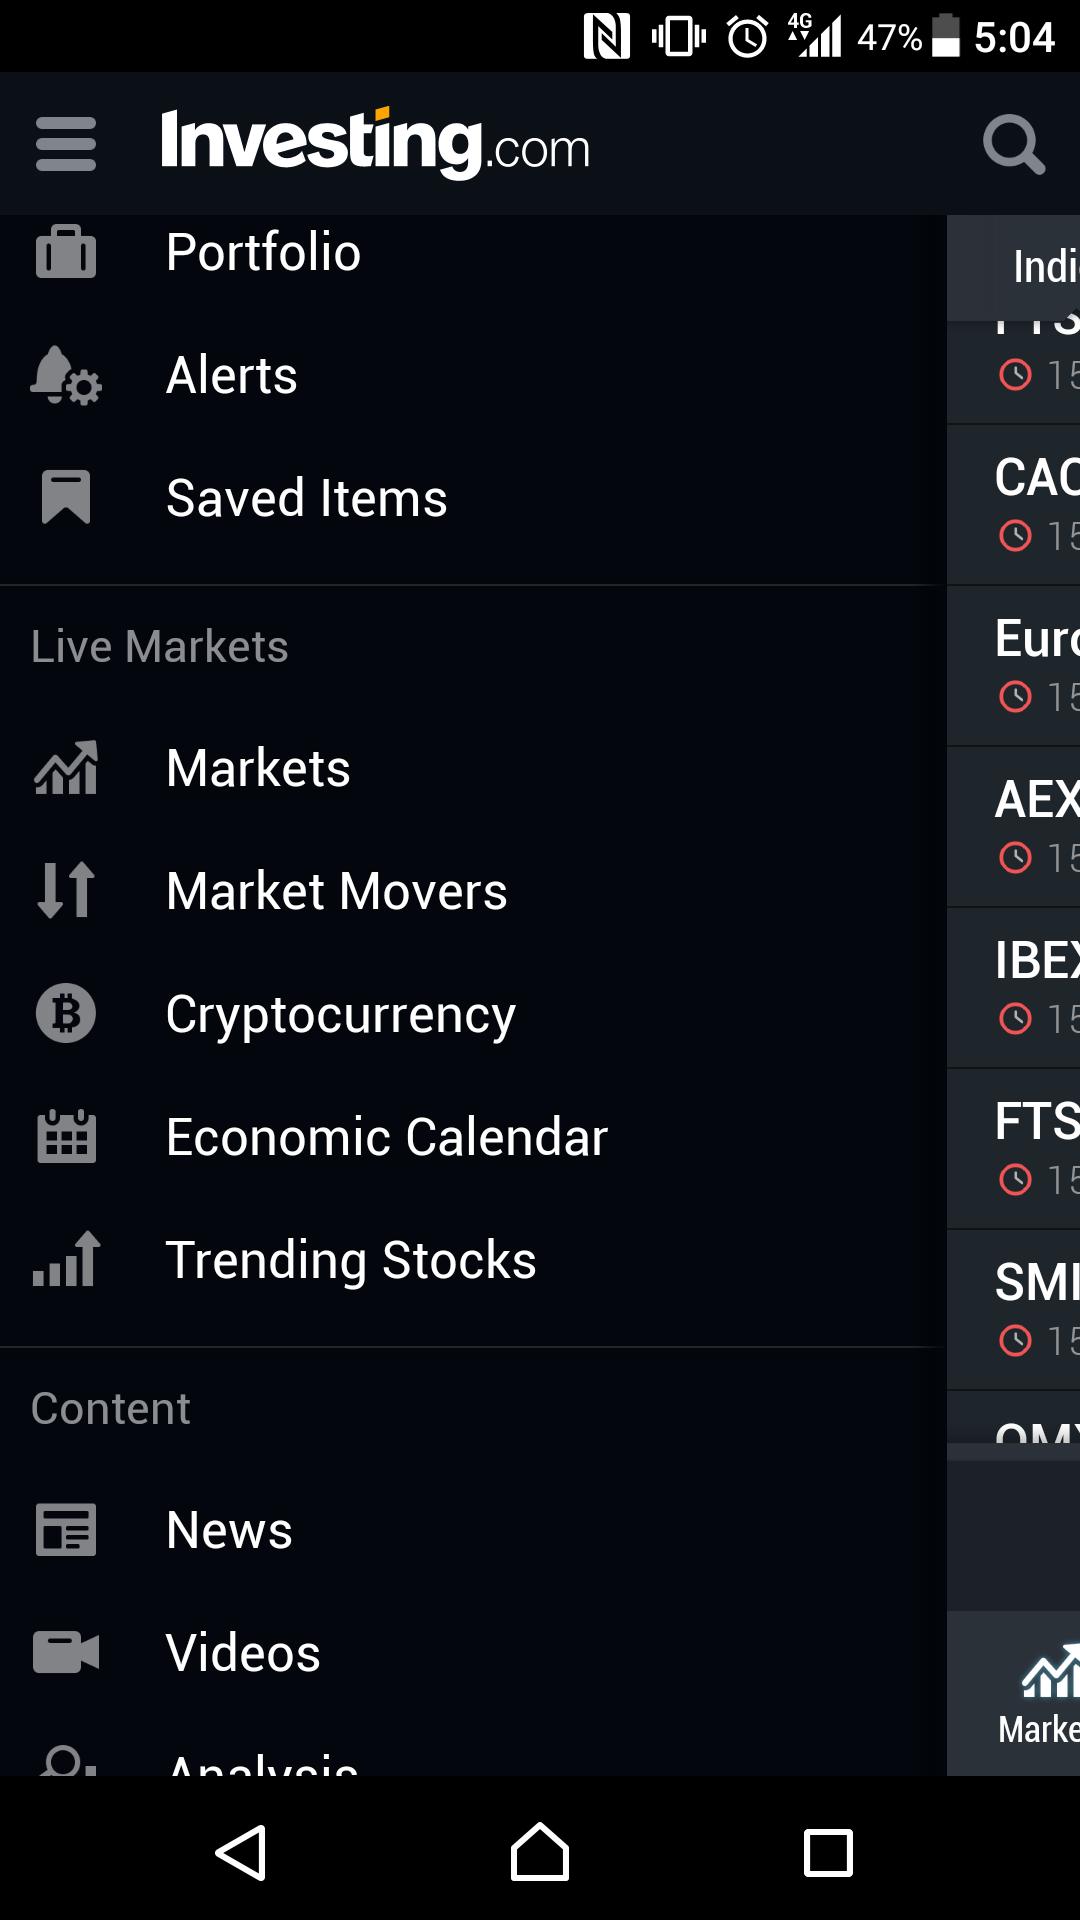 Best-trading-apps-Investing.com-menu